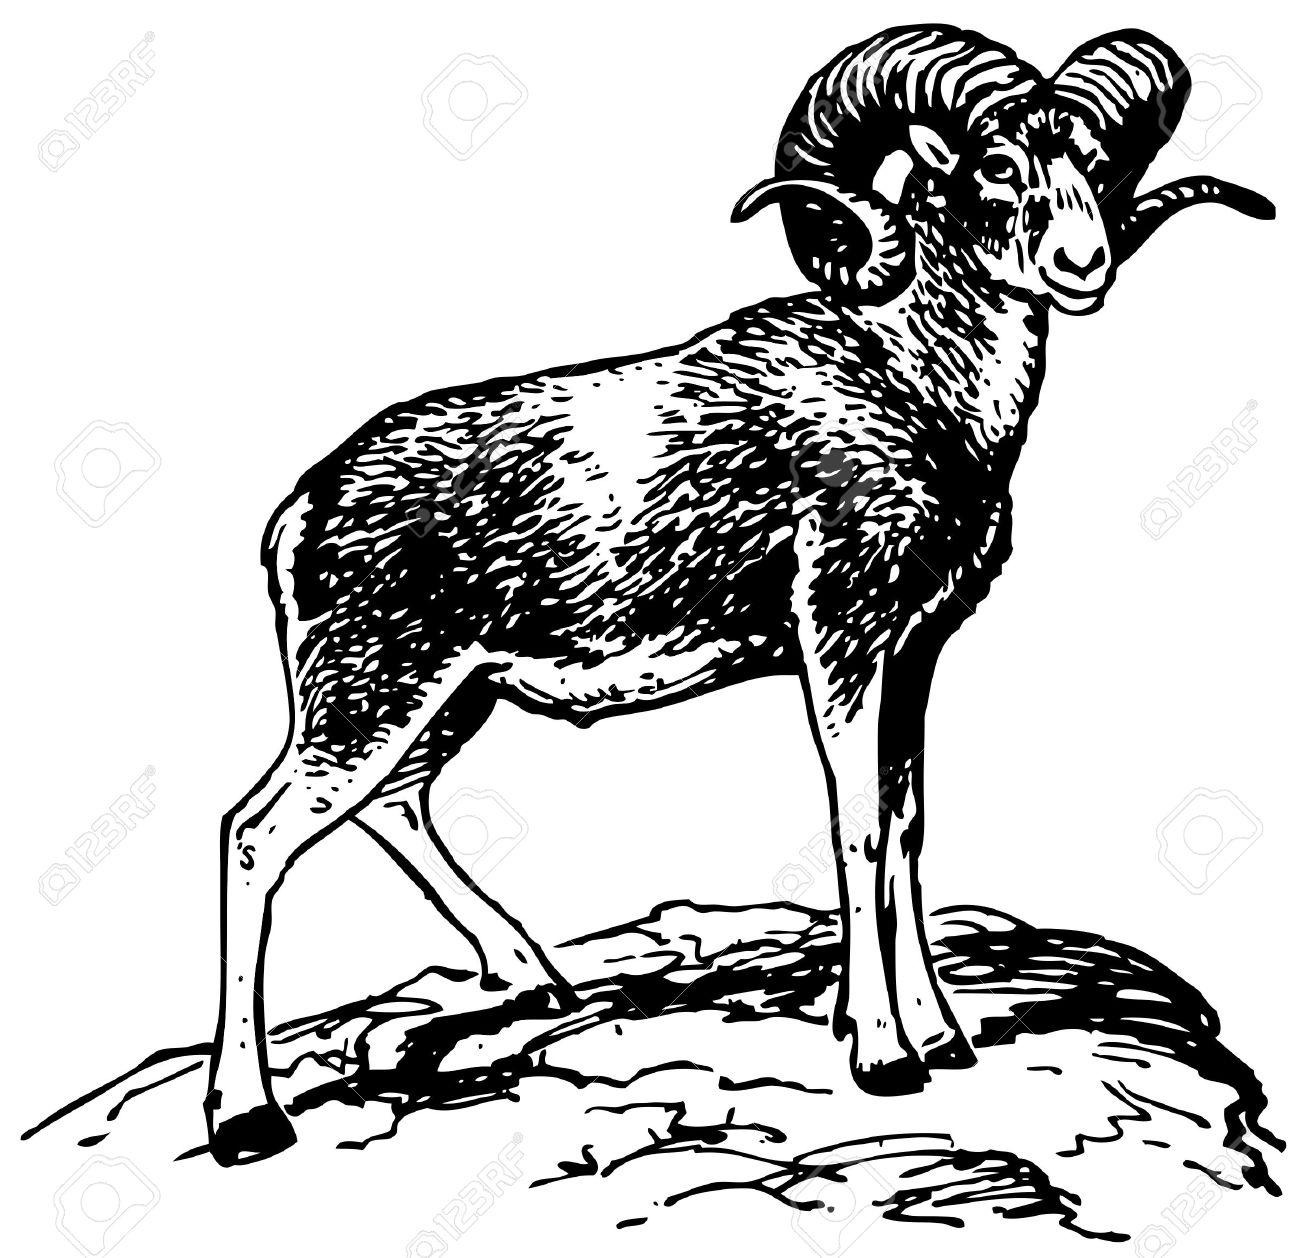 1300x1258 Argali Mountain Sheep Royalty Free Cliparts, Vectors, And Stock